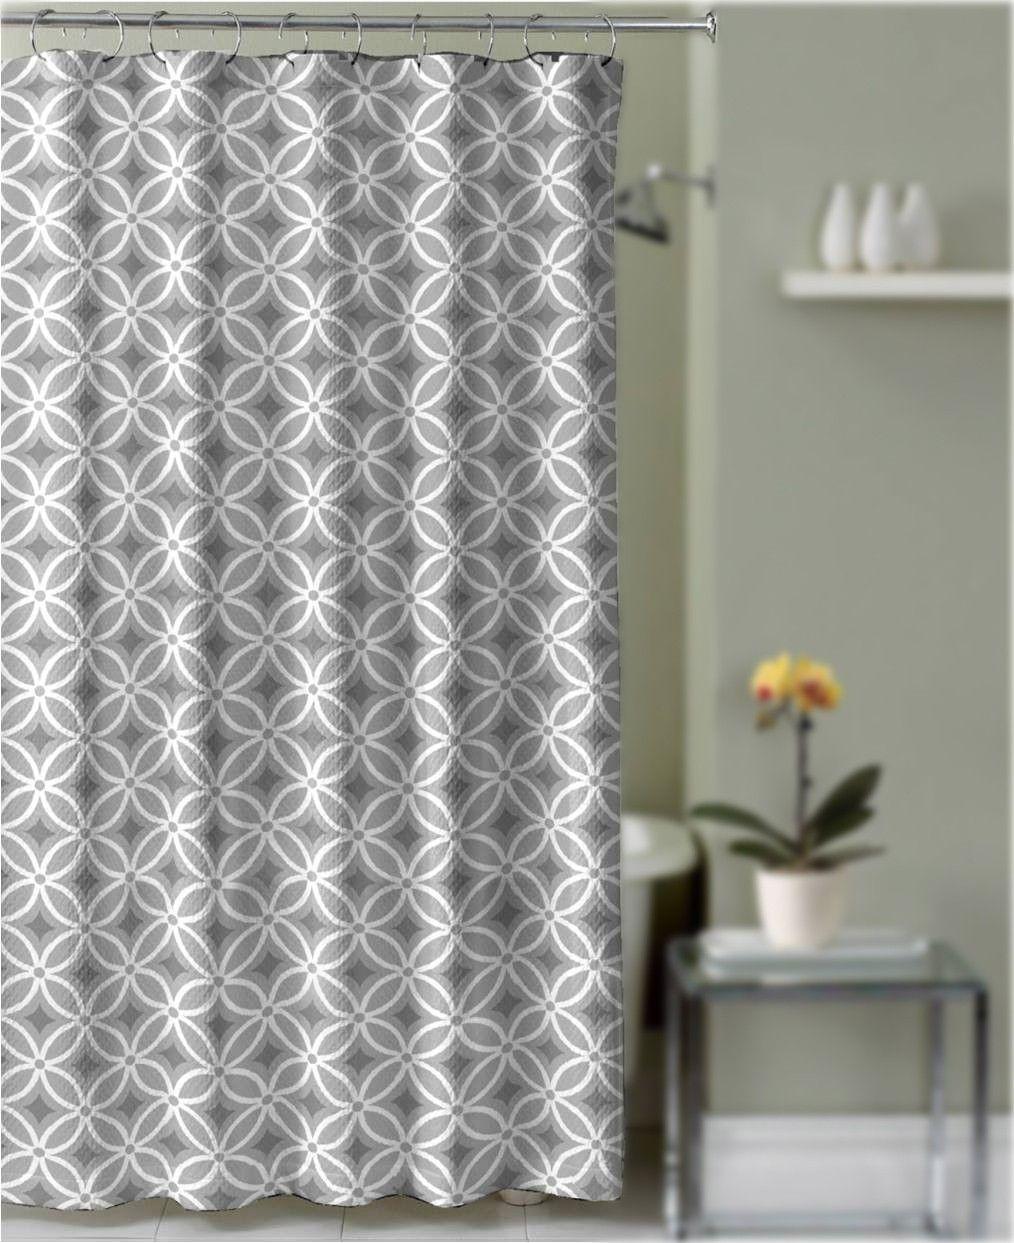 Crest Home Linda Shower Curtain Gray Geometric Trellis Fabric